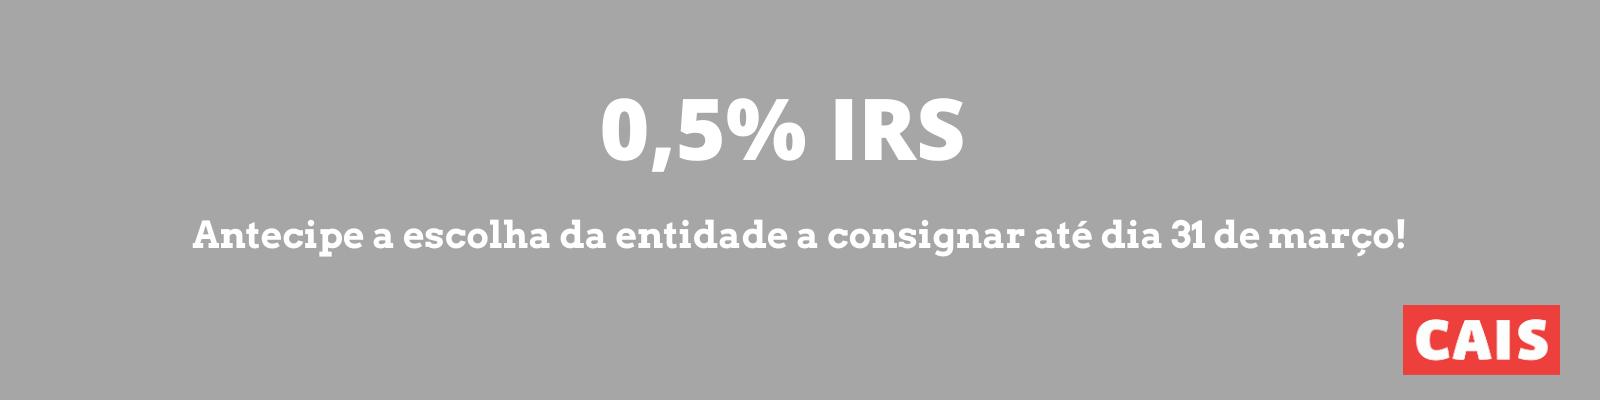 0,5% IRS (2)